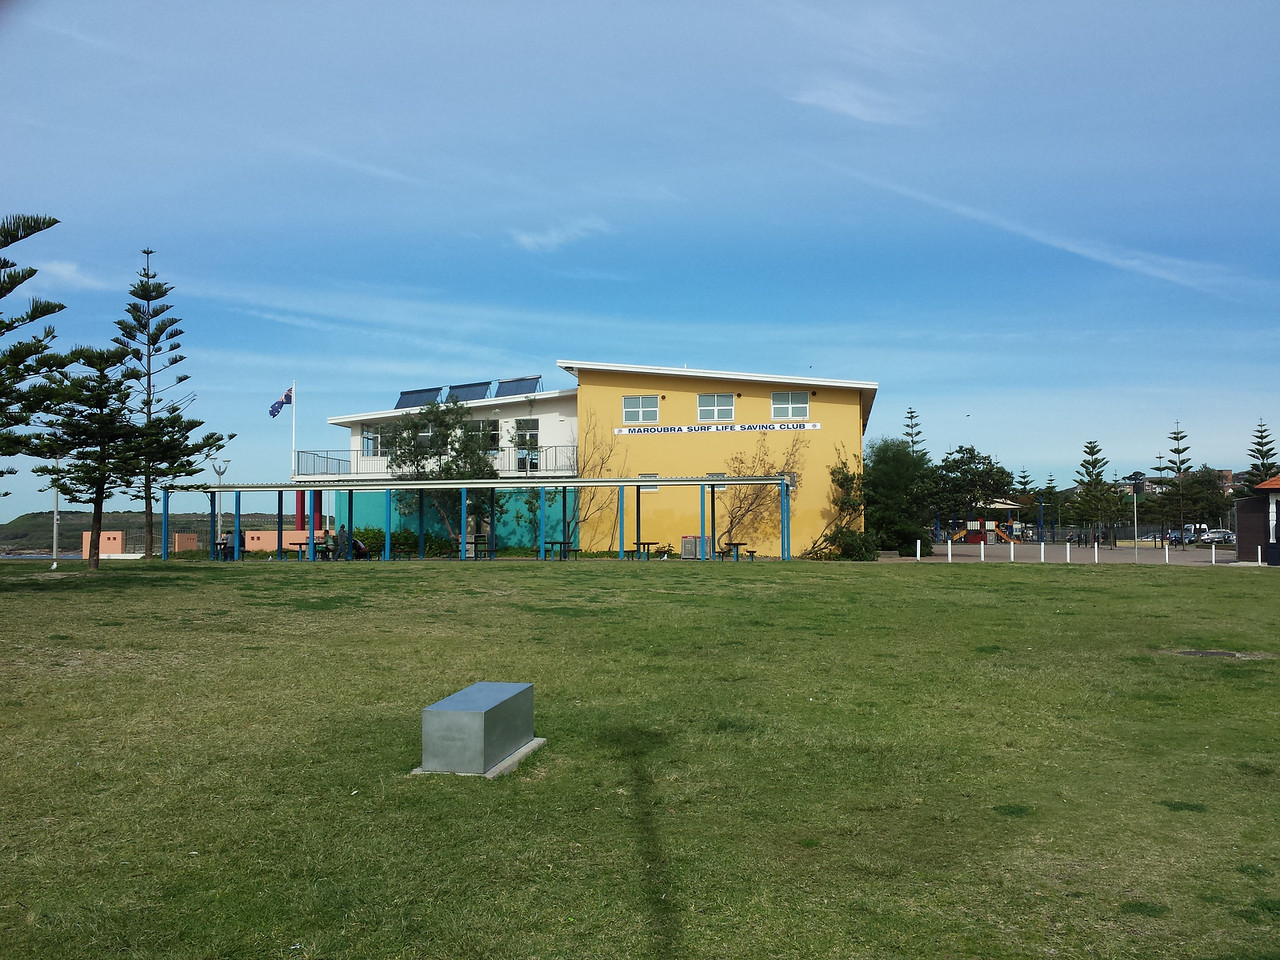 Maroubra Bay